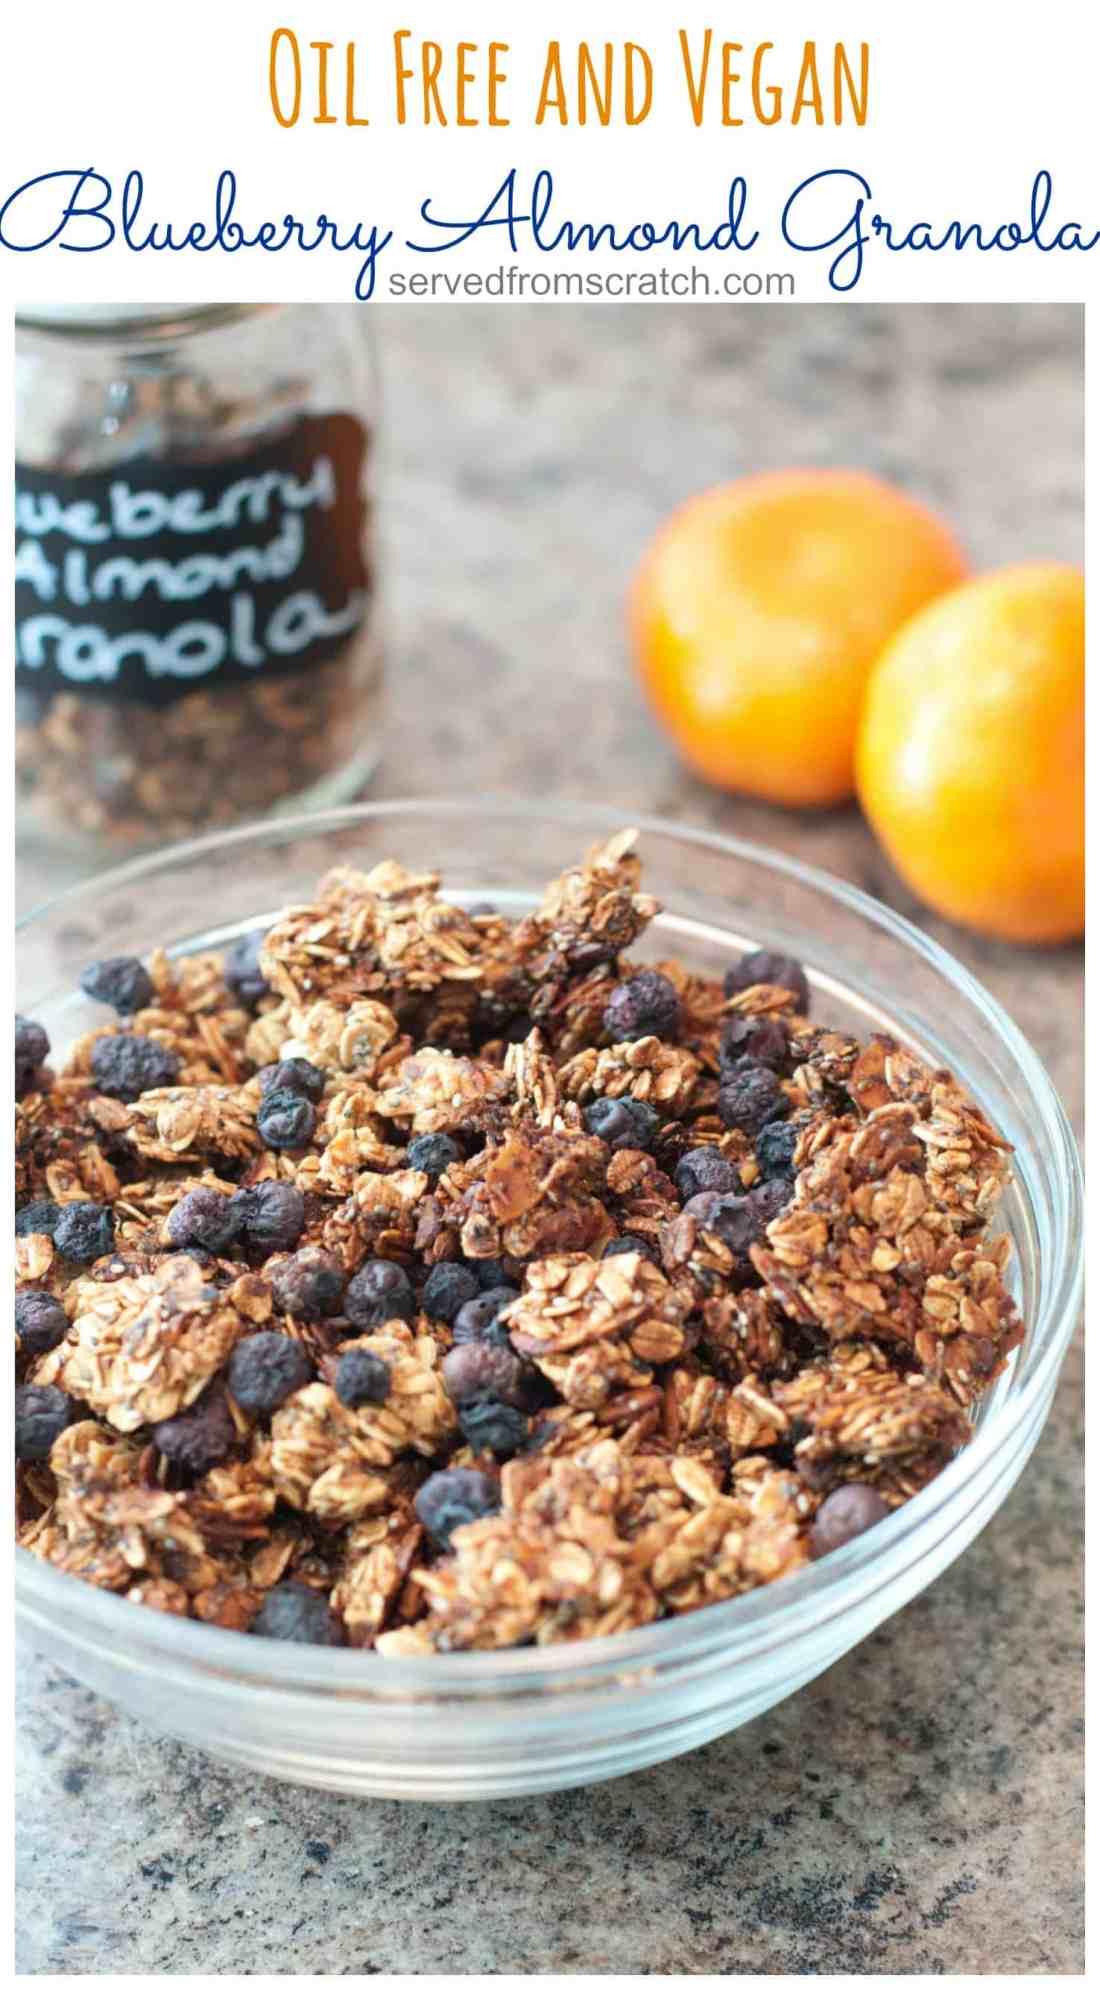 Oil free, vegan Blueberry Almond Granola from scratch